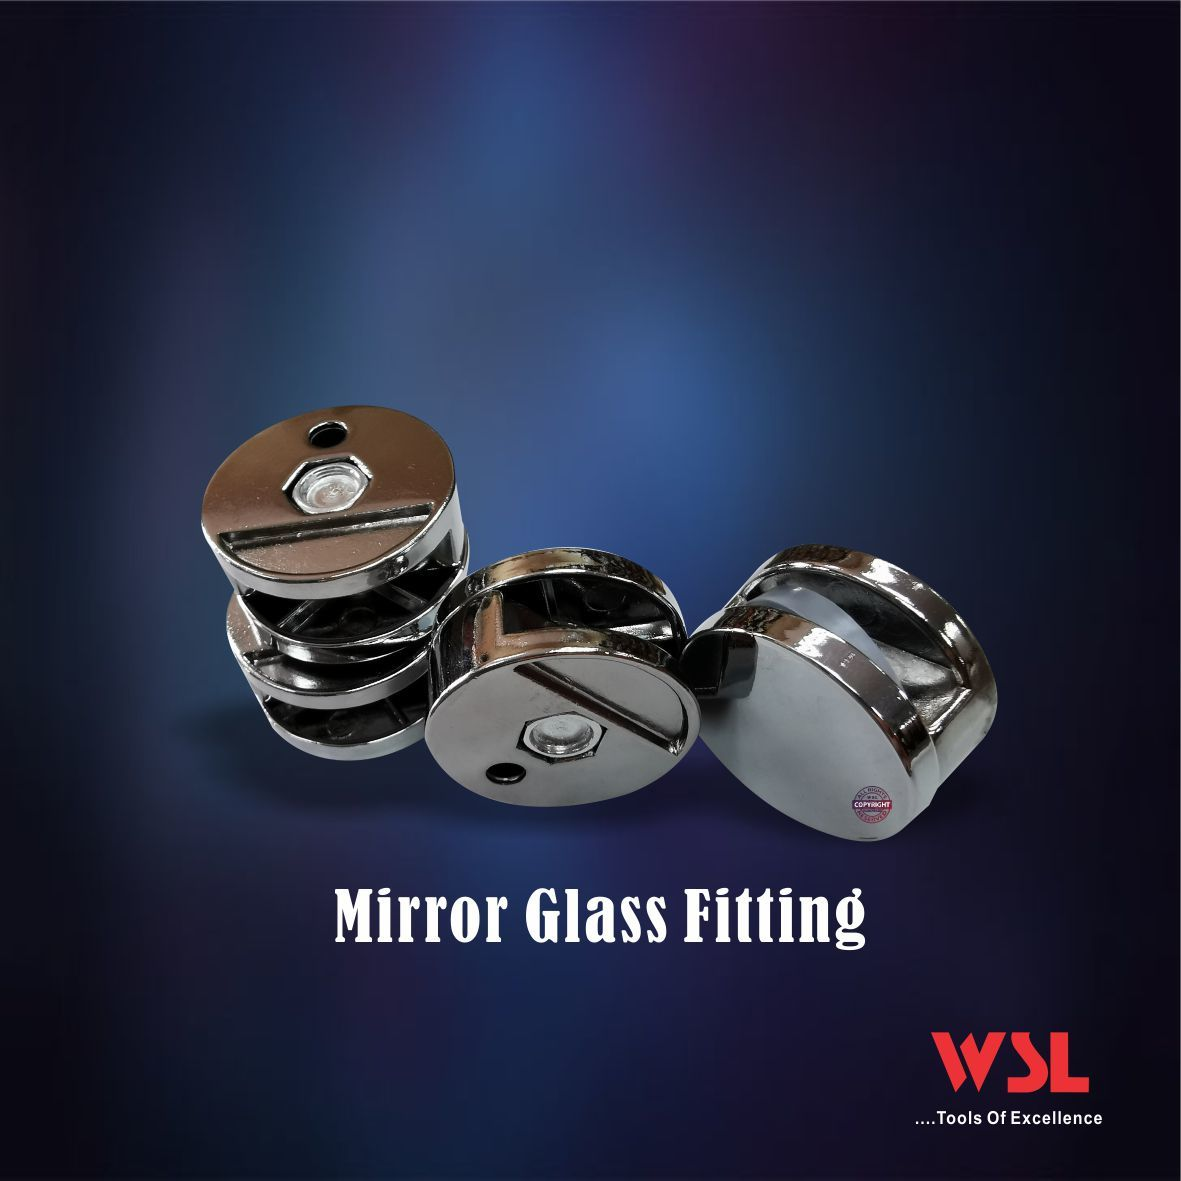 mirror glass fitting.jpg